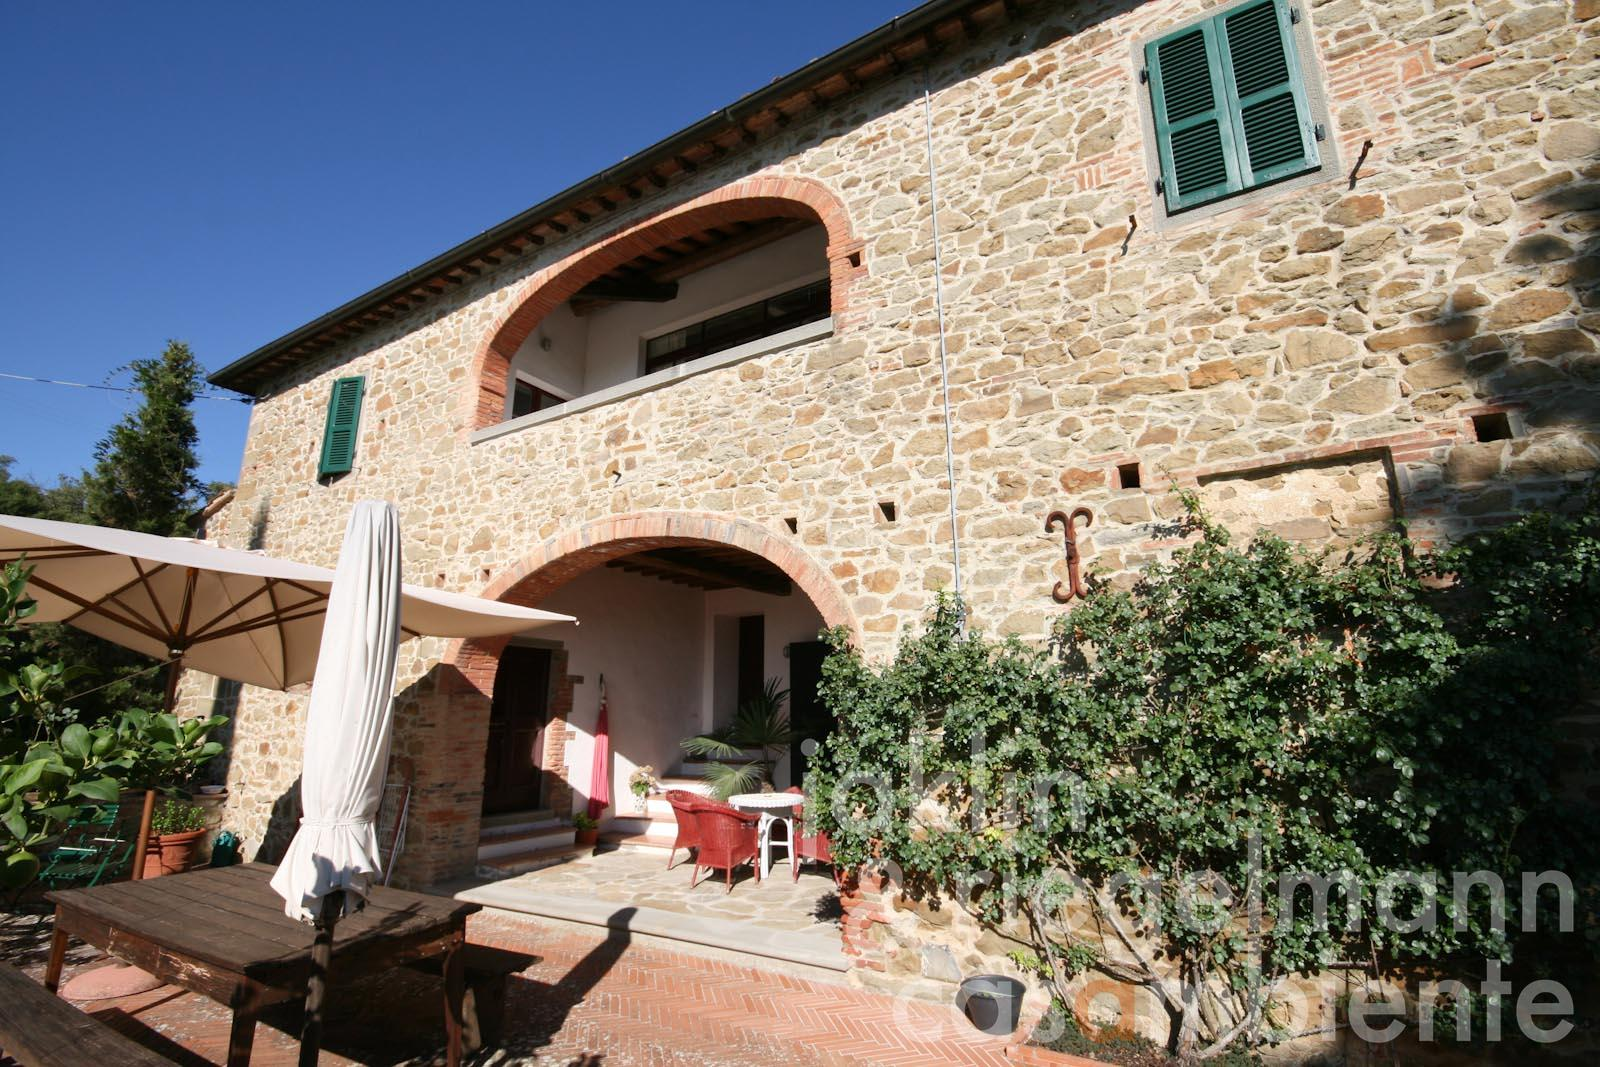 Residenza di campagna in vendita in italia toscana siena for Case california in vendita con piscina